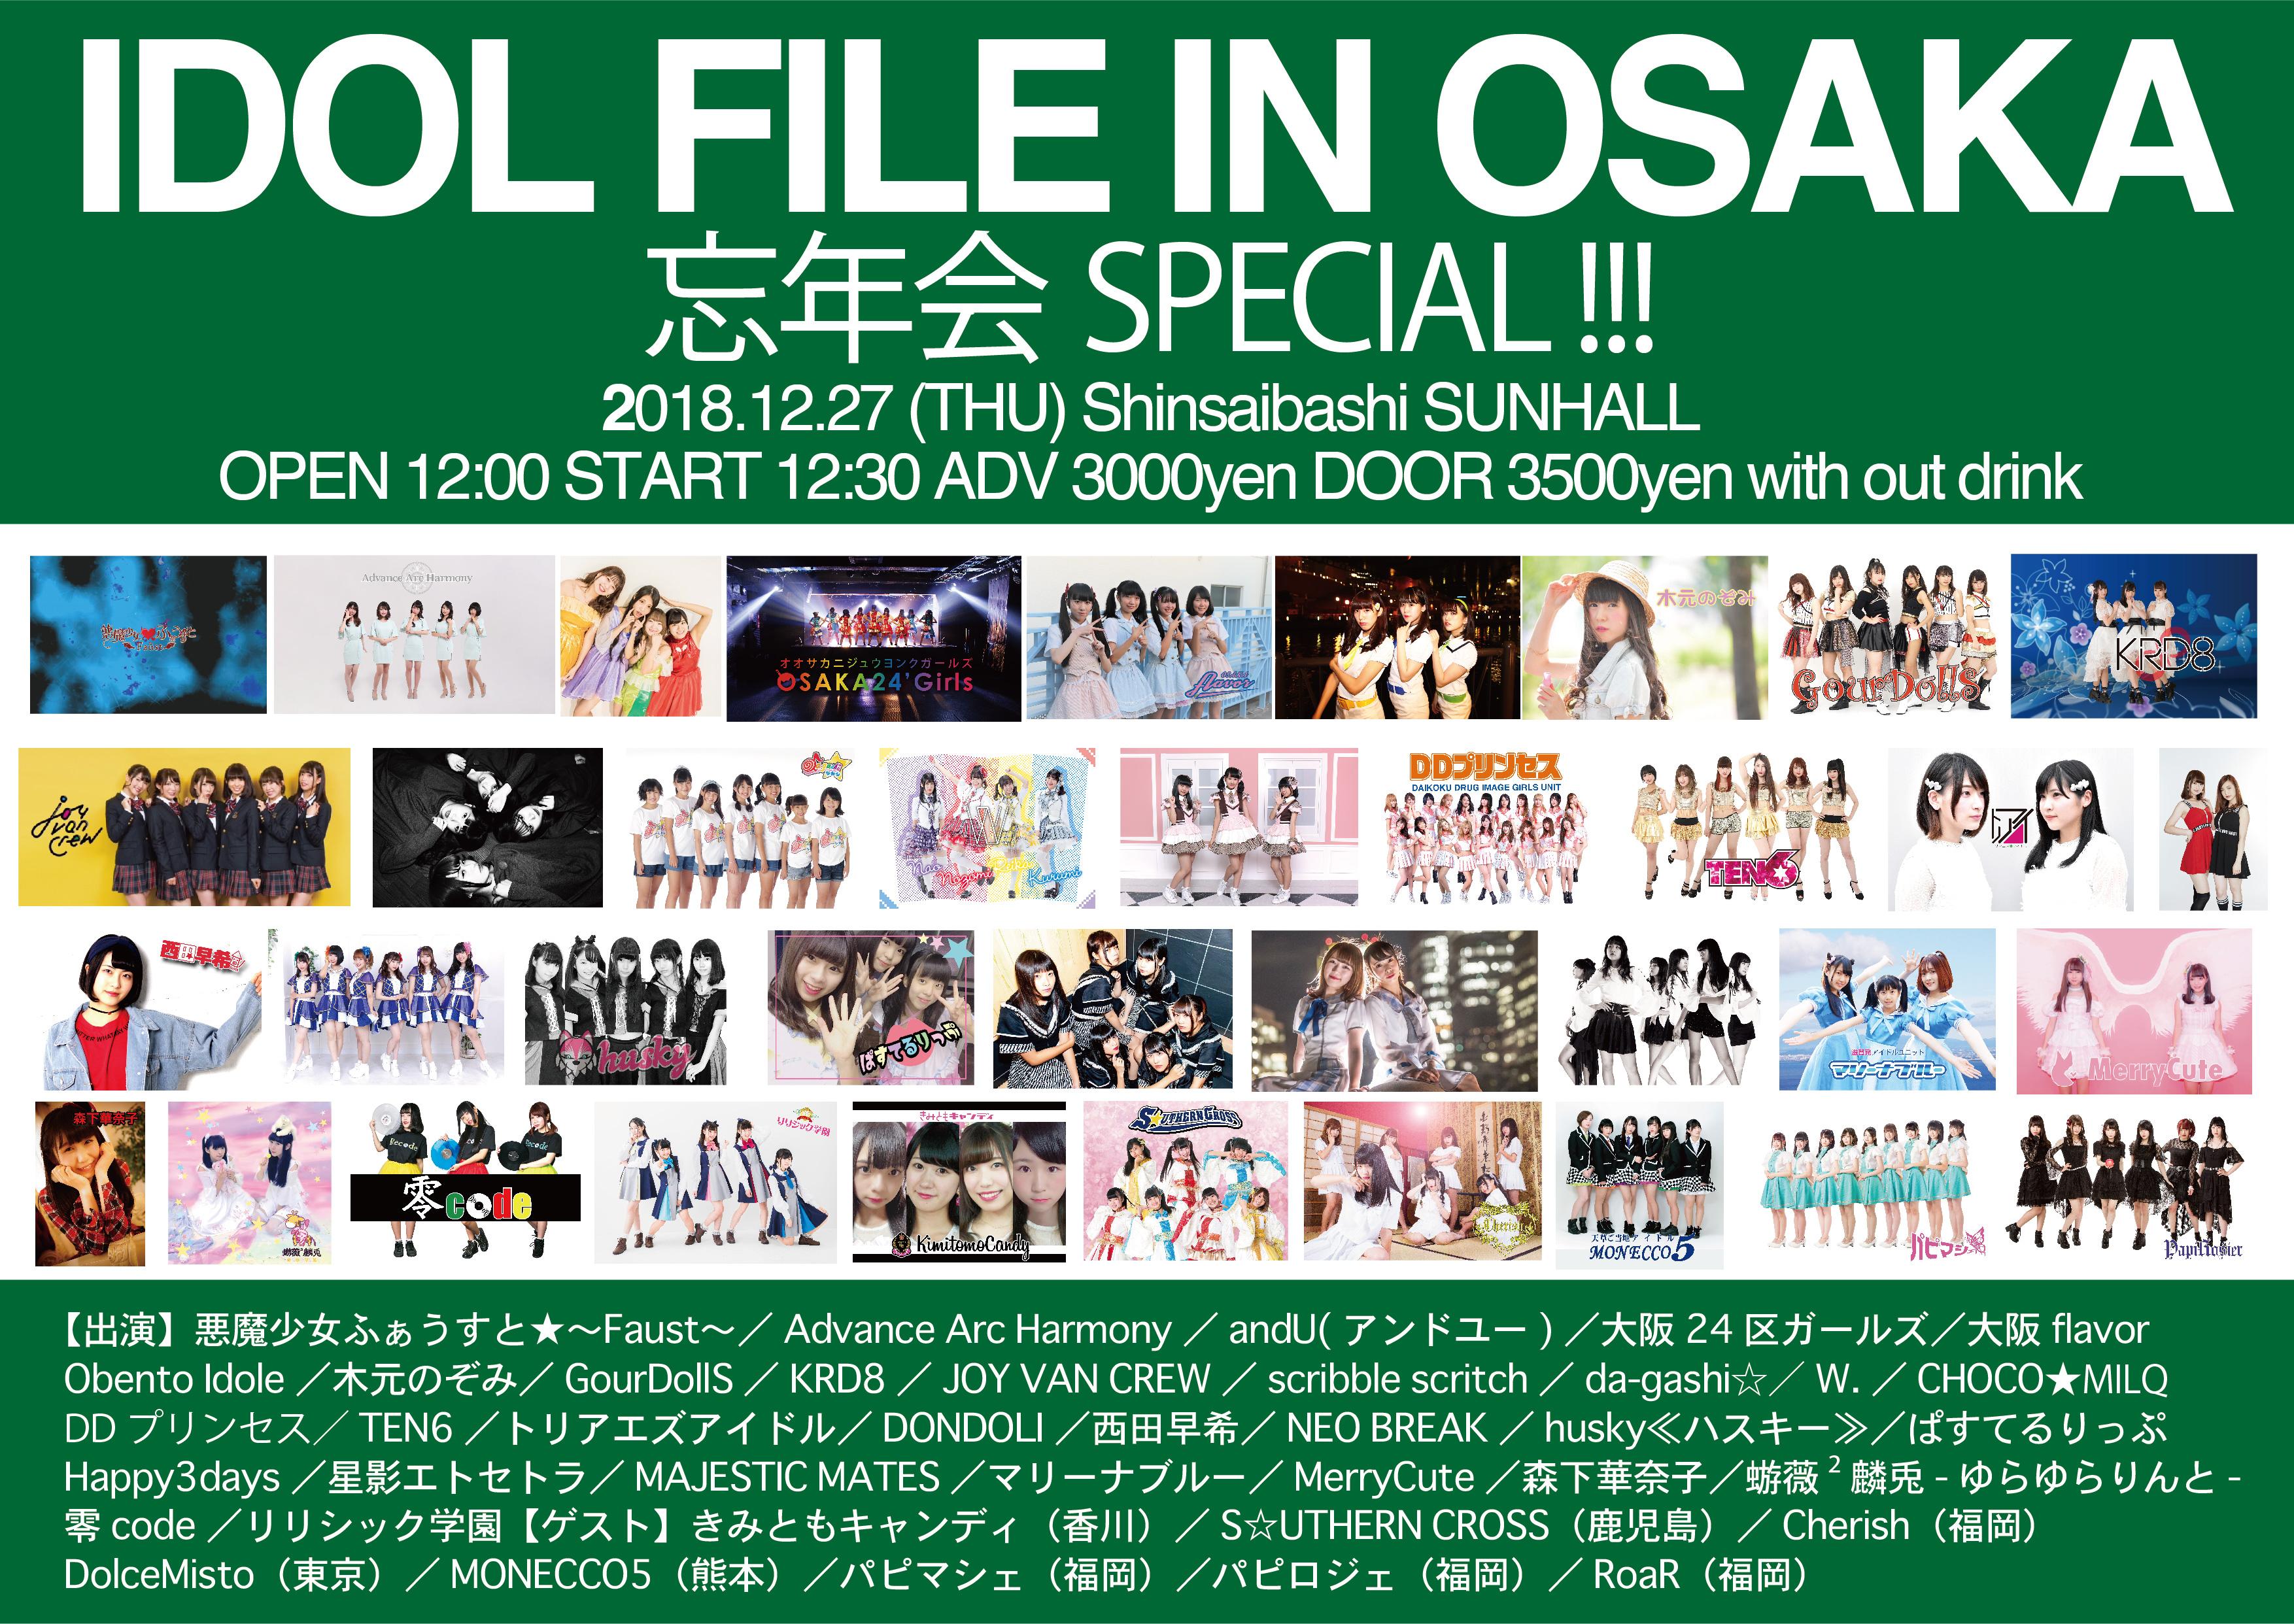 IDOL FILE IN OSAKA 忘年会SPECIAL!!! day.2